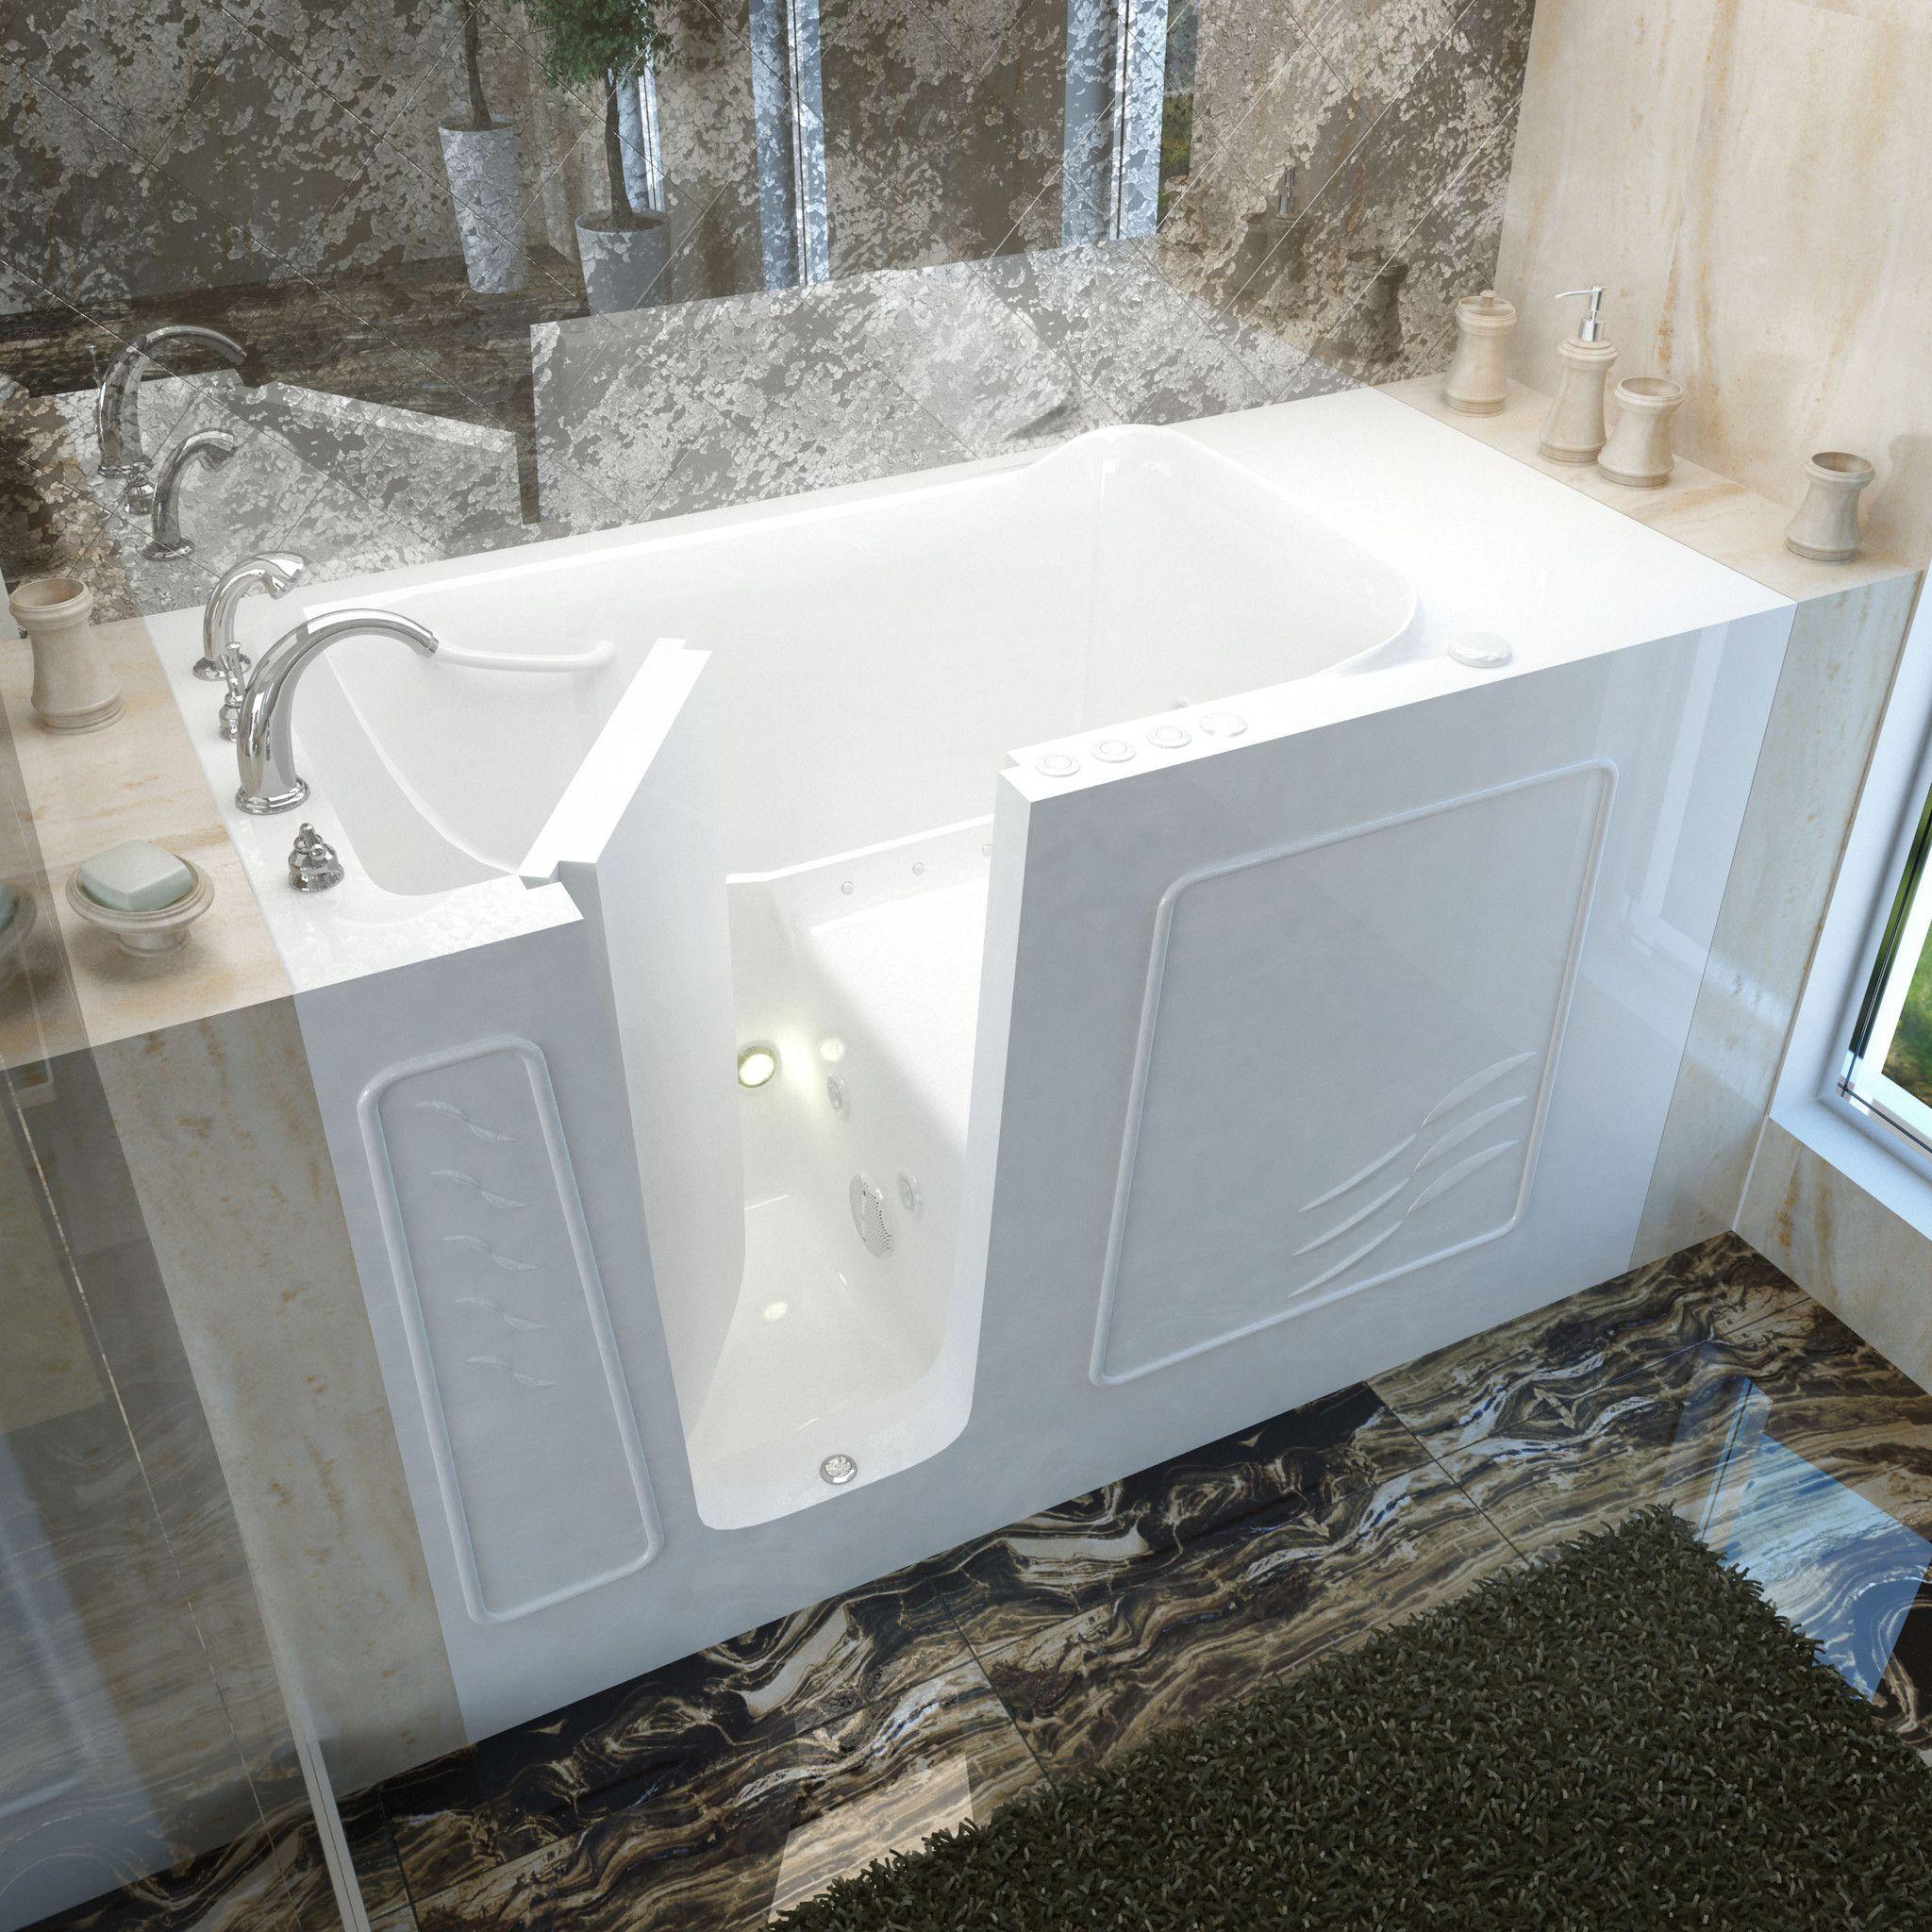 MediTub 3060WILWD Walk-In 30 x 60 Left Drain White Whirlpool & Air ...